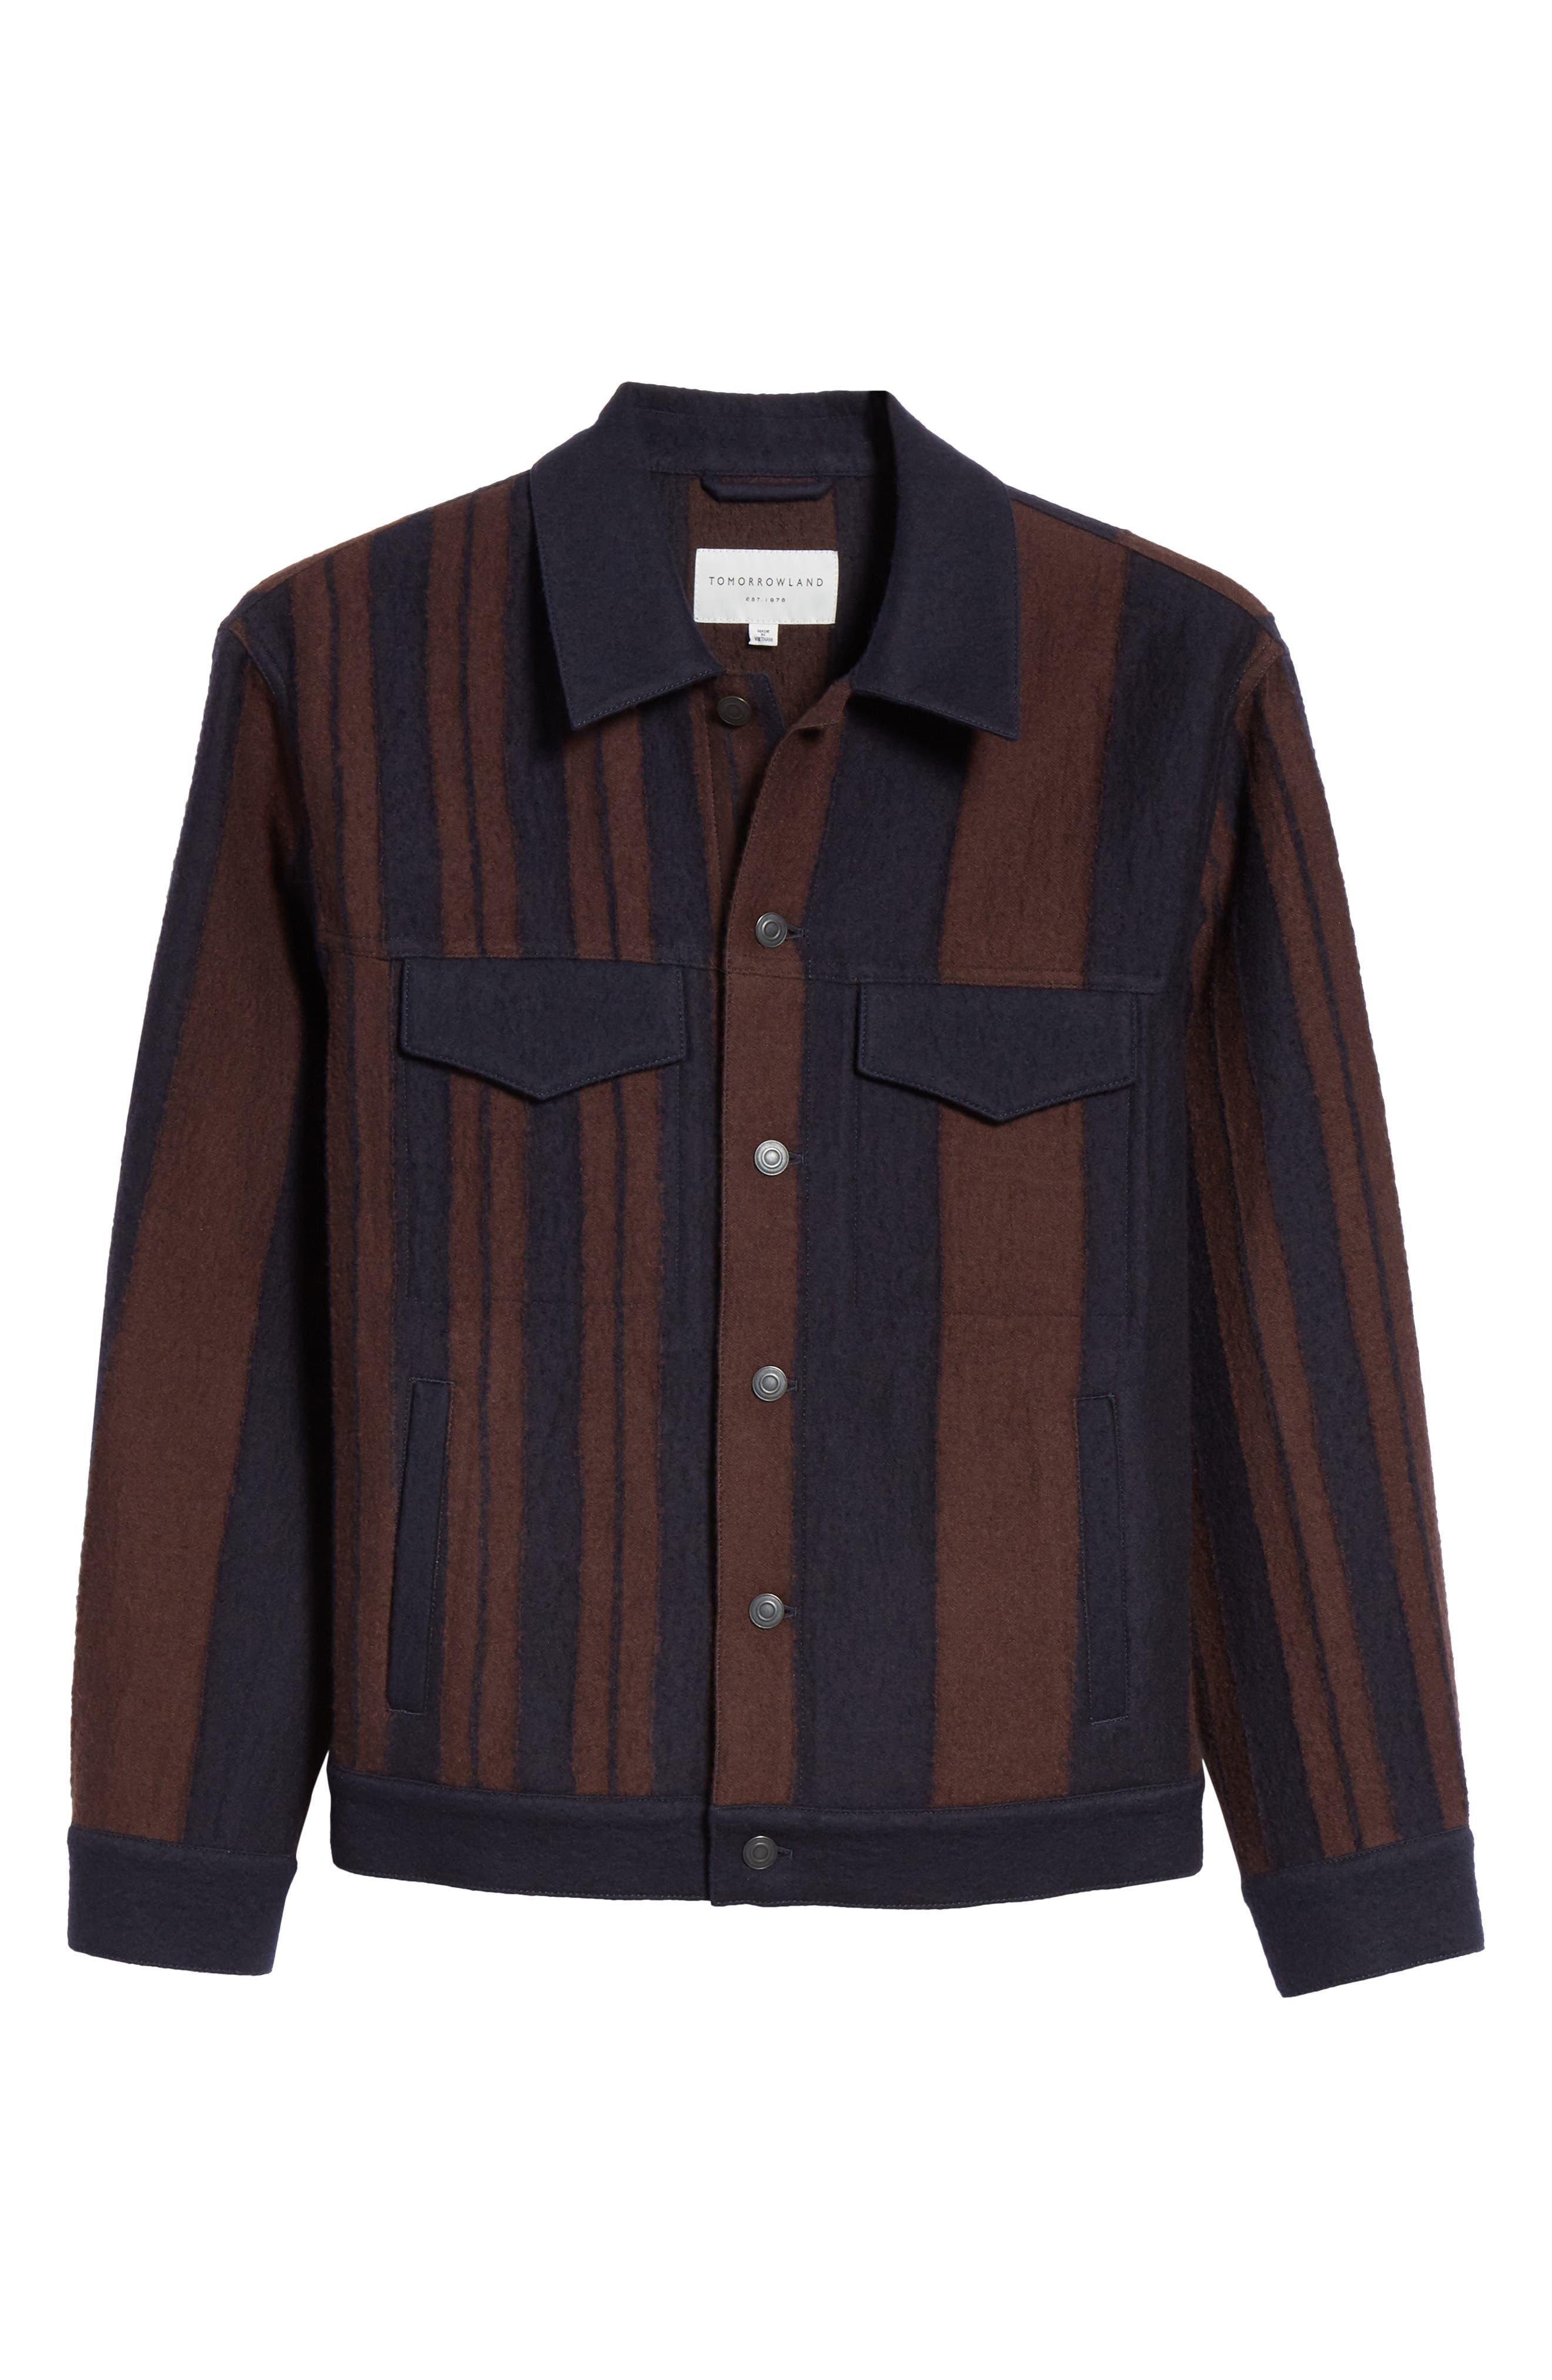 Stripe Wool Blend Jacket,                             Alternate thumbnail 5, color,                             001